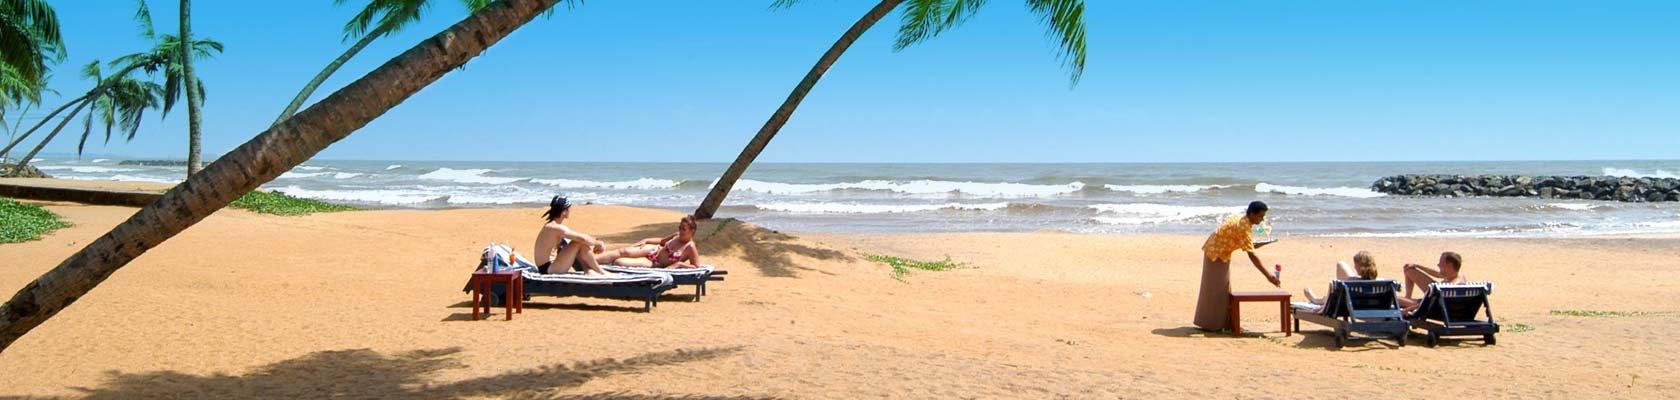 Strand van Sri Lanka